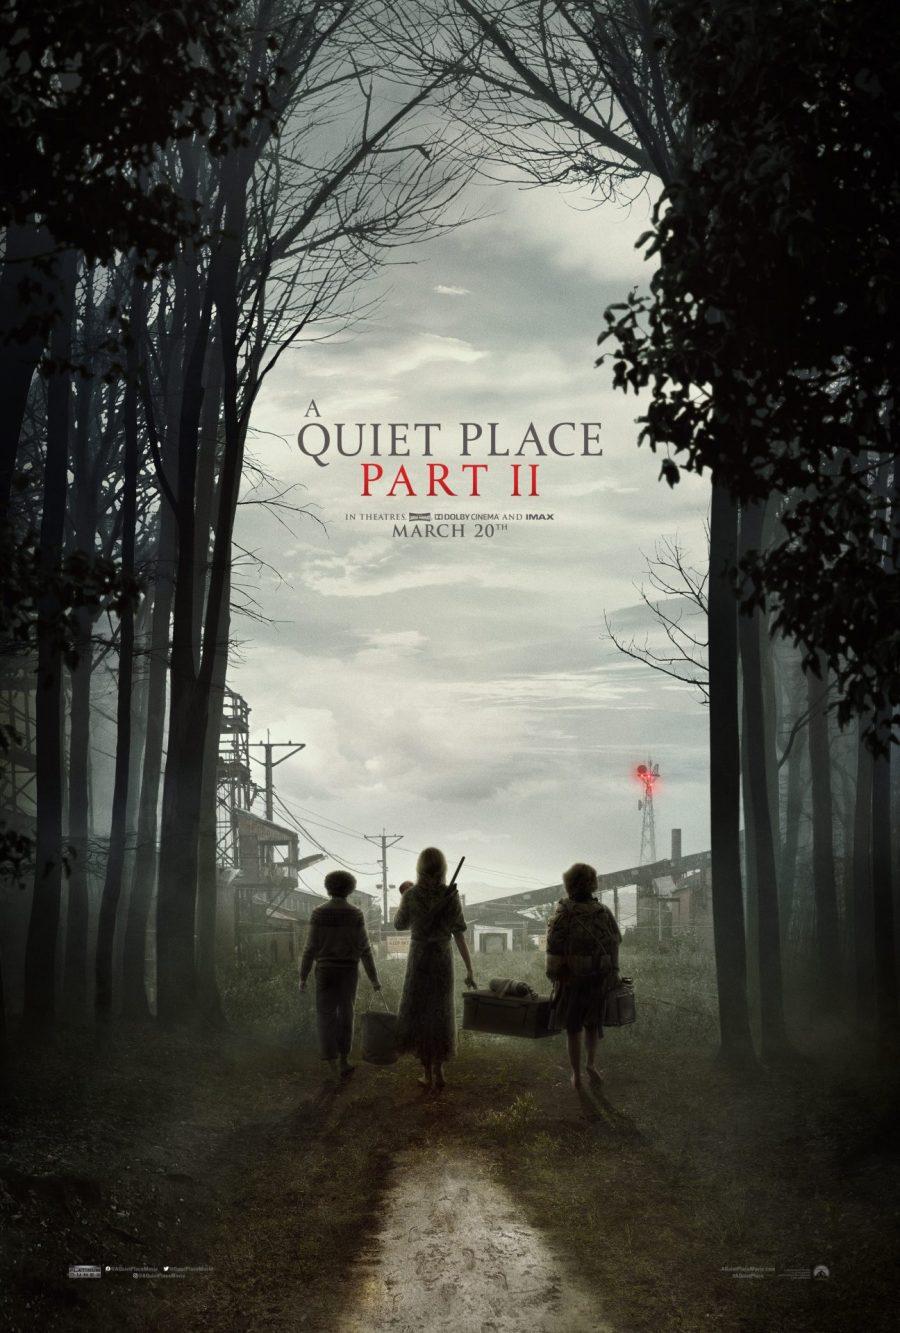 A-Quiet-Place-Part-II-Poster-e1576682282487.jpg